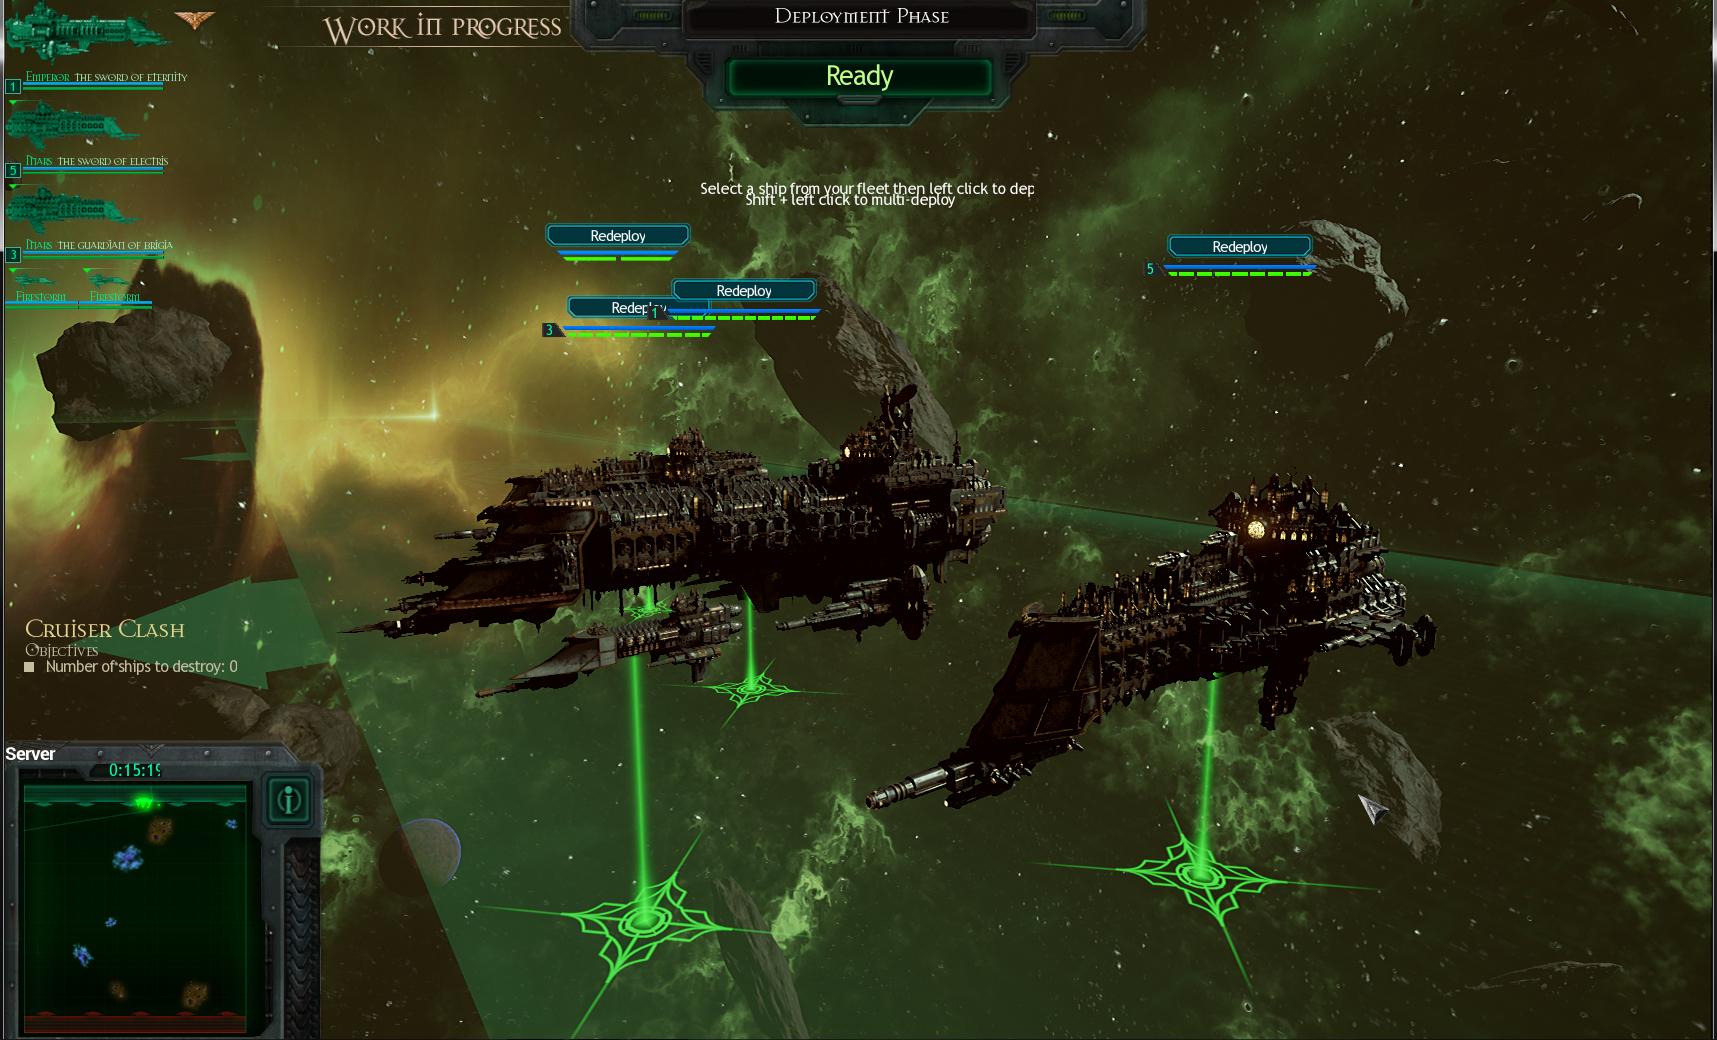 [Jeu vidéo] Battlefleet Gothic : Armada - Page 6 143954battleship